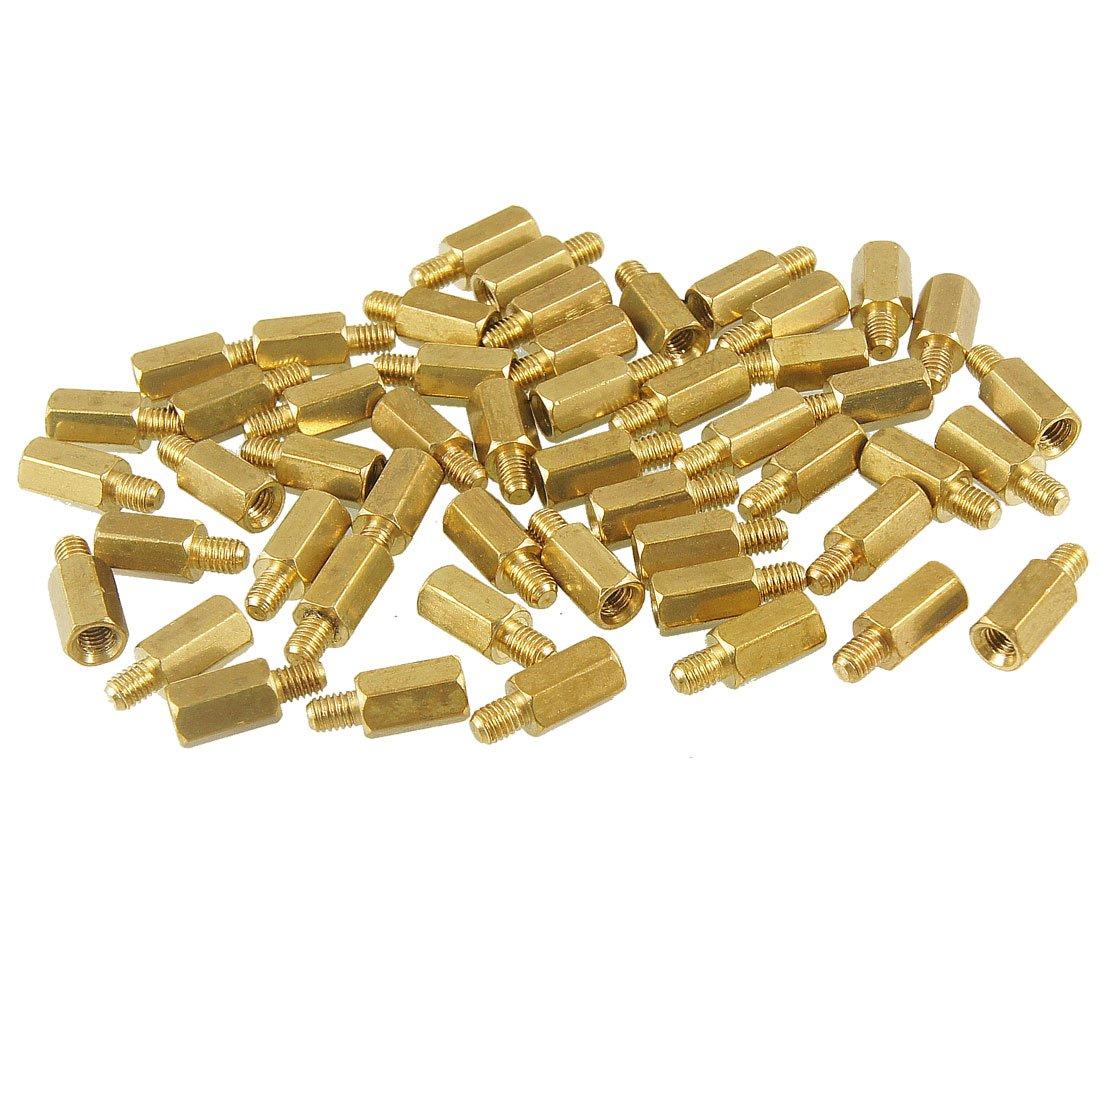 MOCC M3 Male x M3 Female 8mm Long Hexagonal Brass PCB Standoffs Spacers 50 Pcs thgs 50 pcs brass screw hexagonal stand off spacer m3 male x m3 female 12mm body length